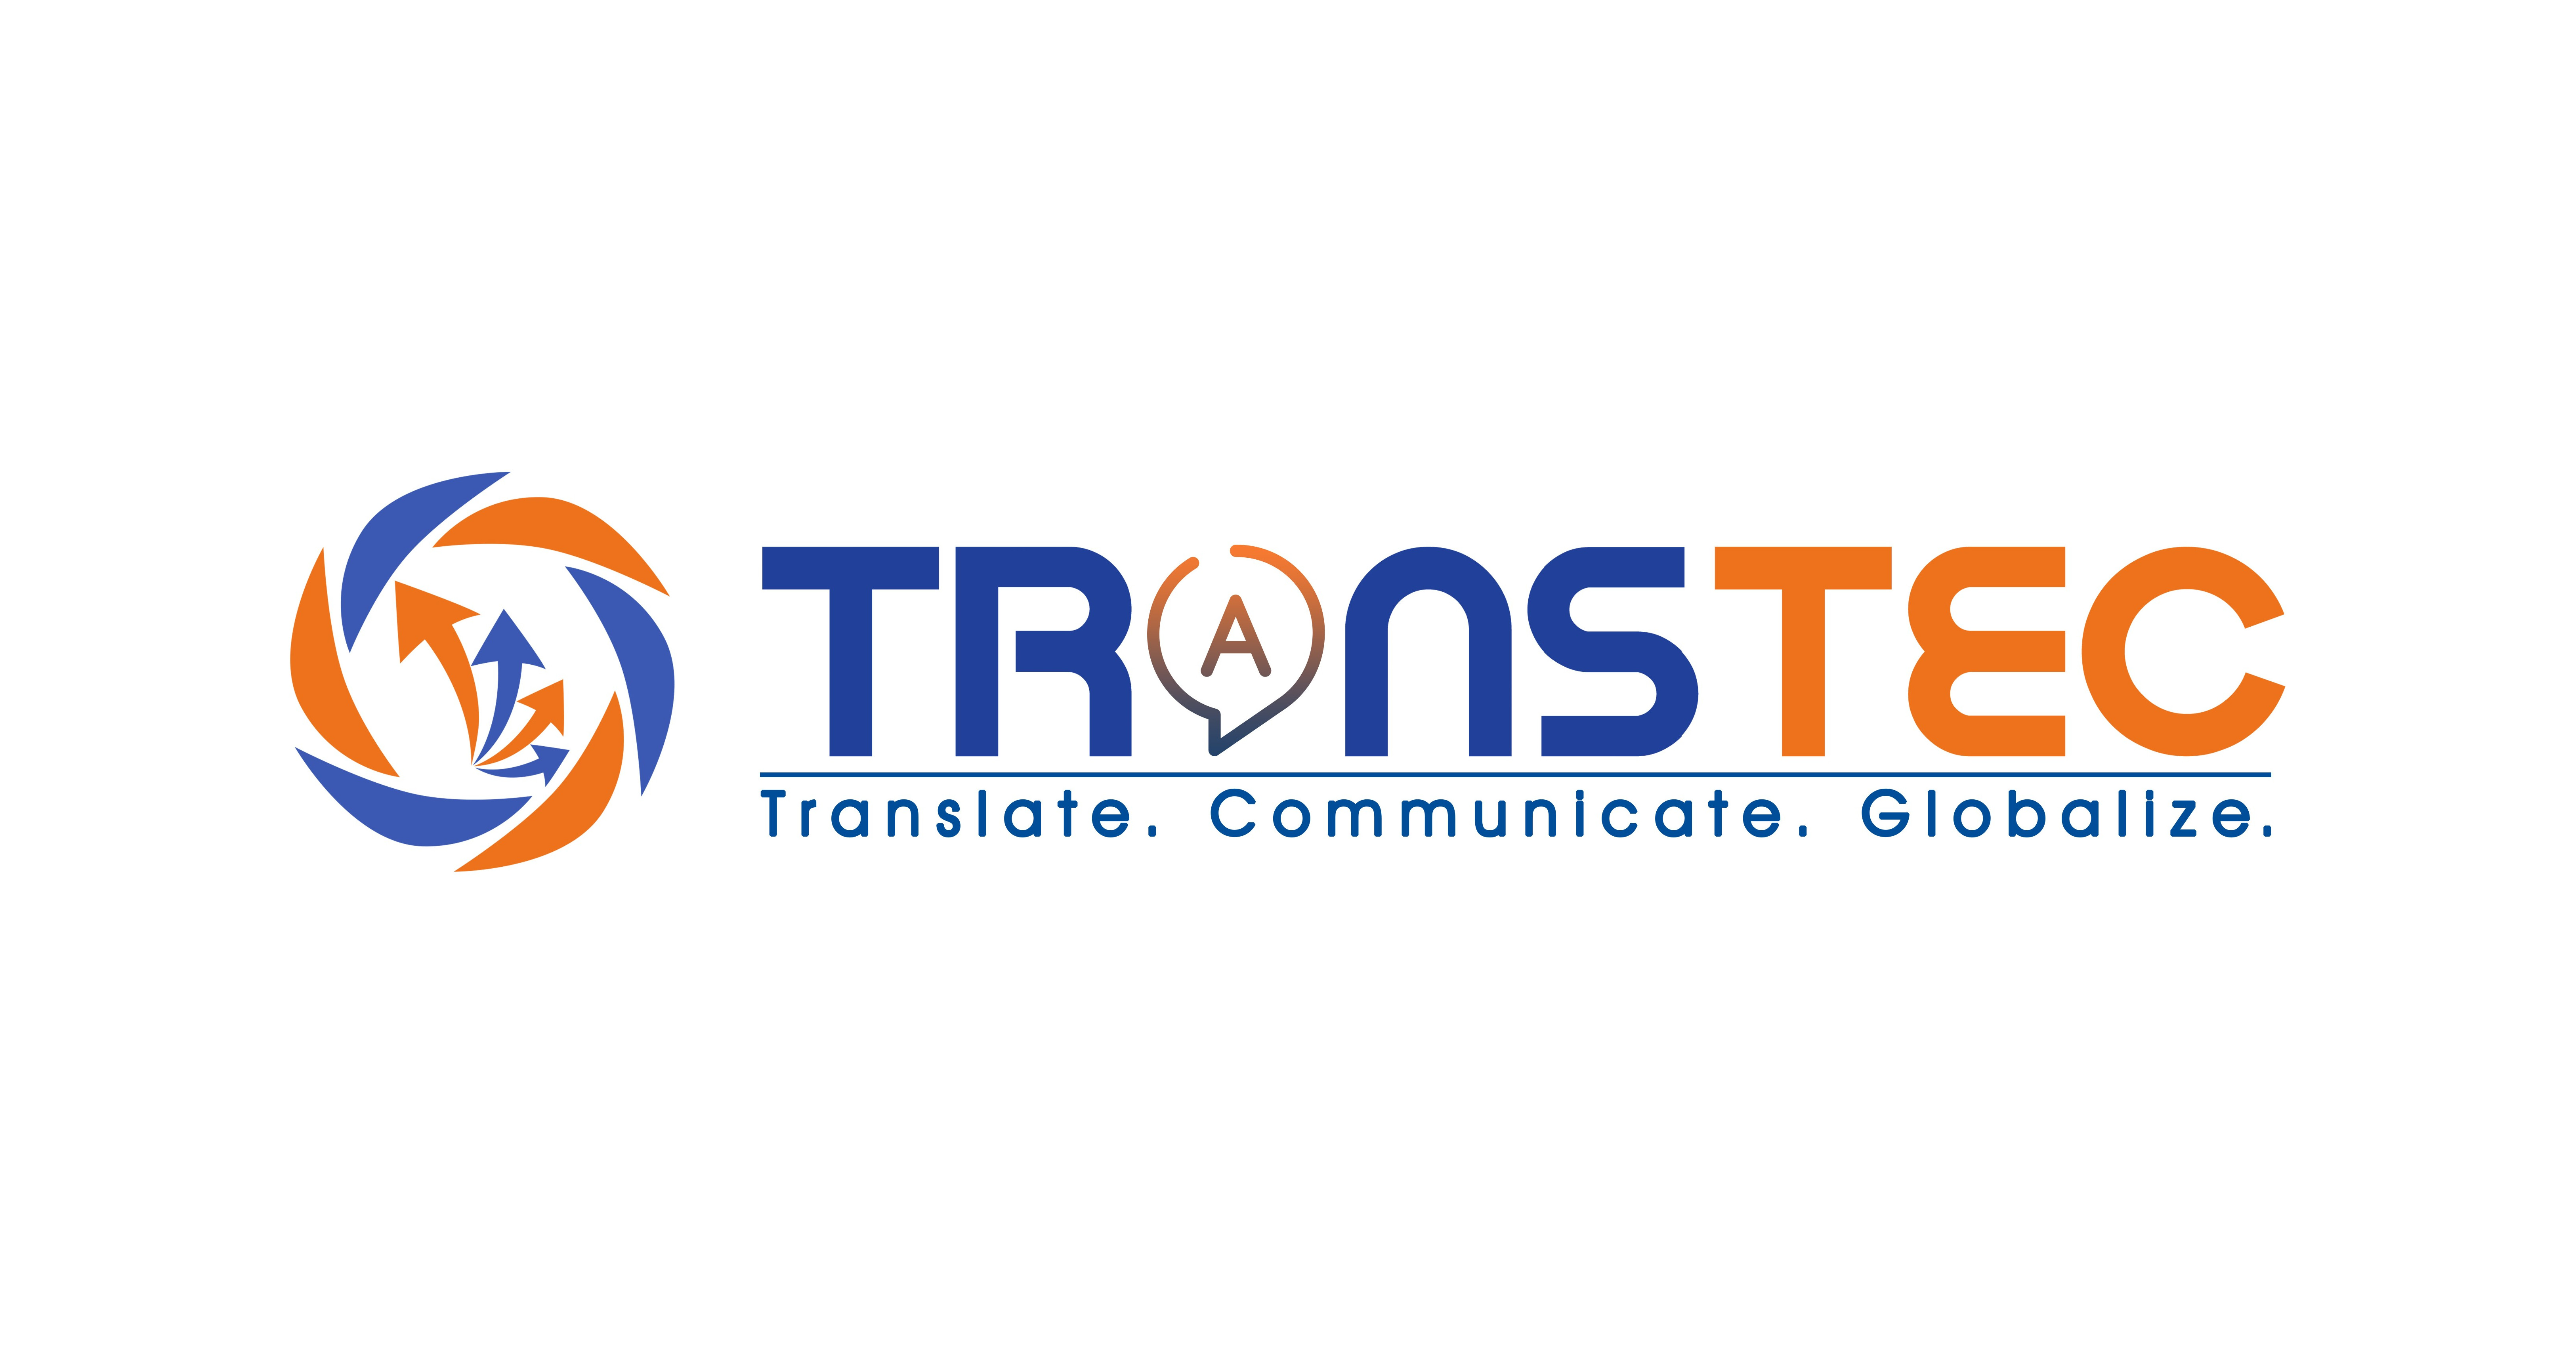 صورة Job: Business Development Specialist at Transtec Translation in Cairo, Egypt